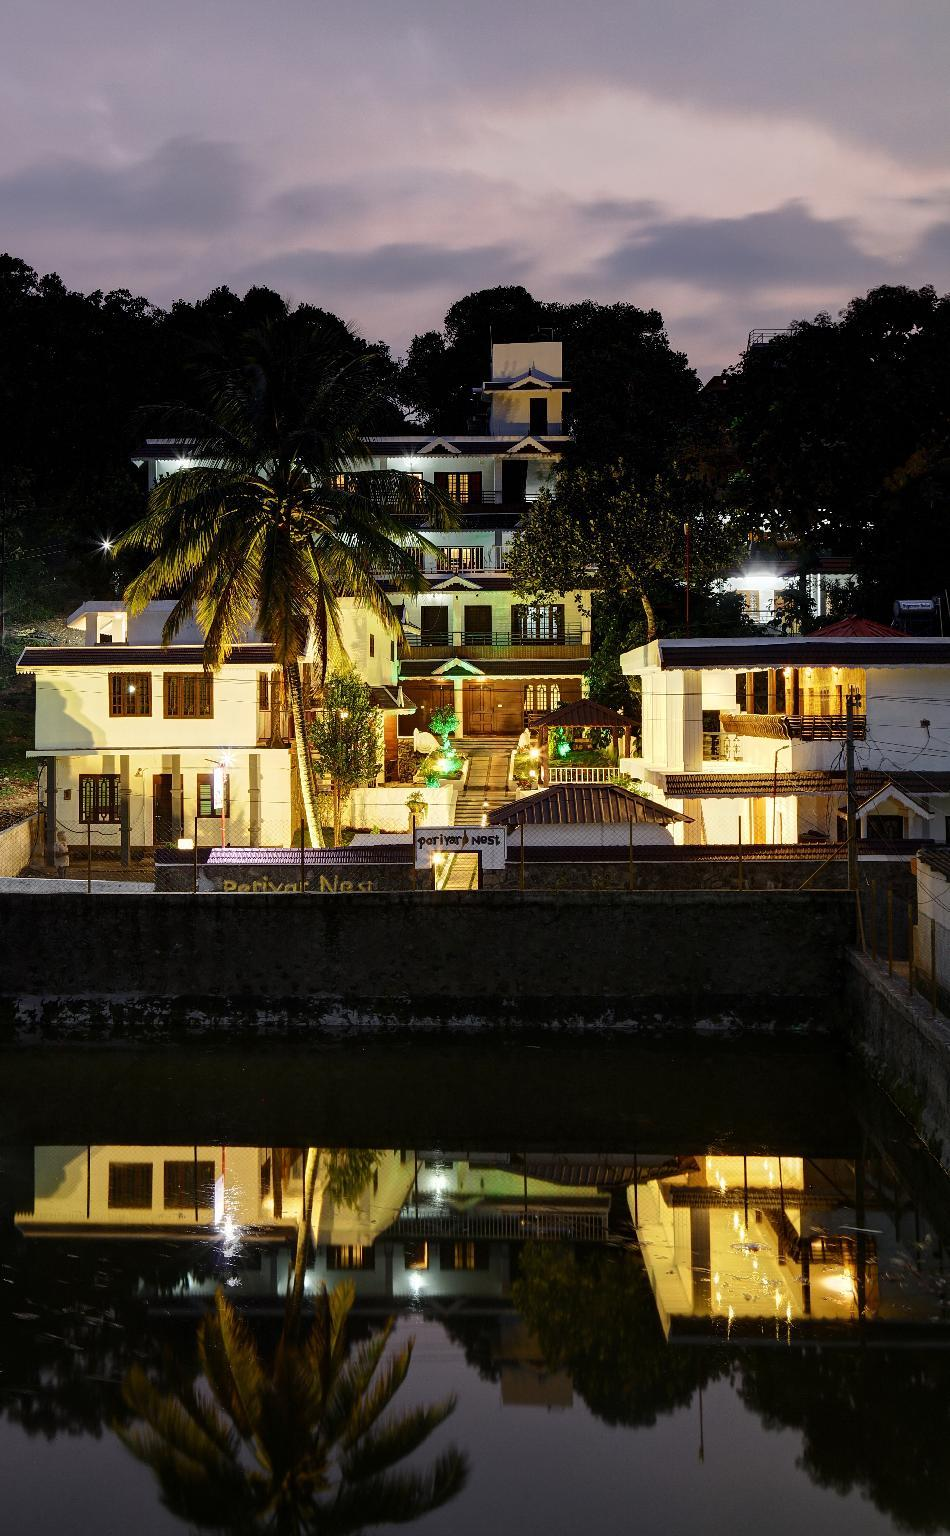 Periyar Nest Resort 4